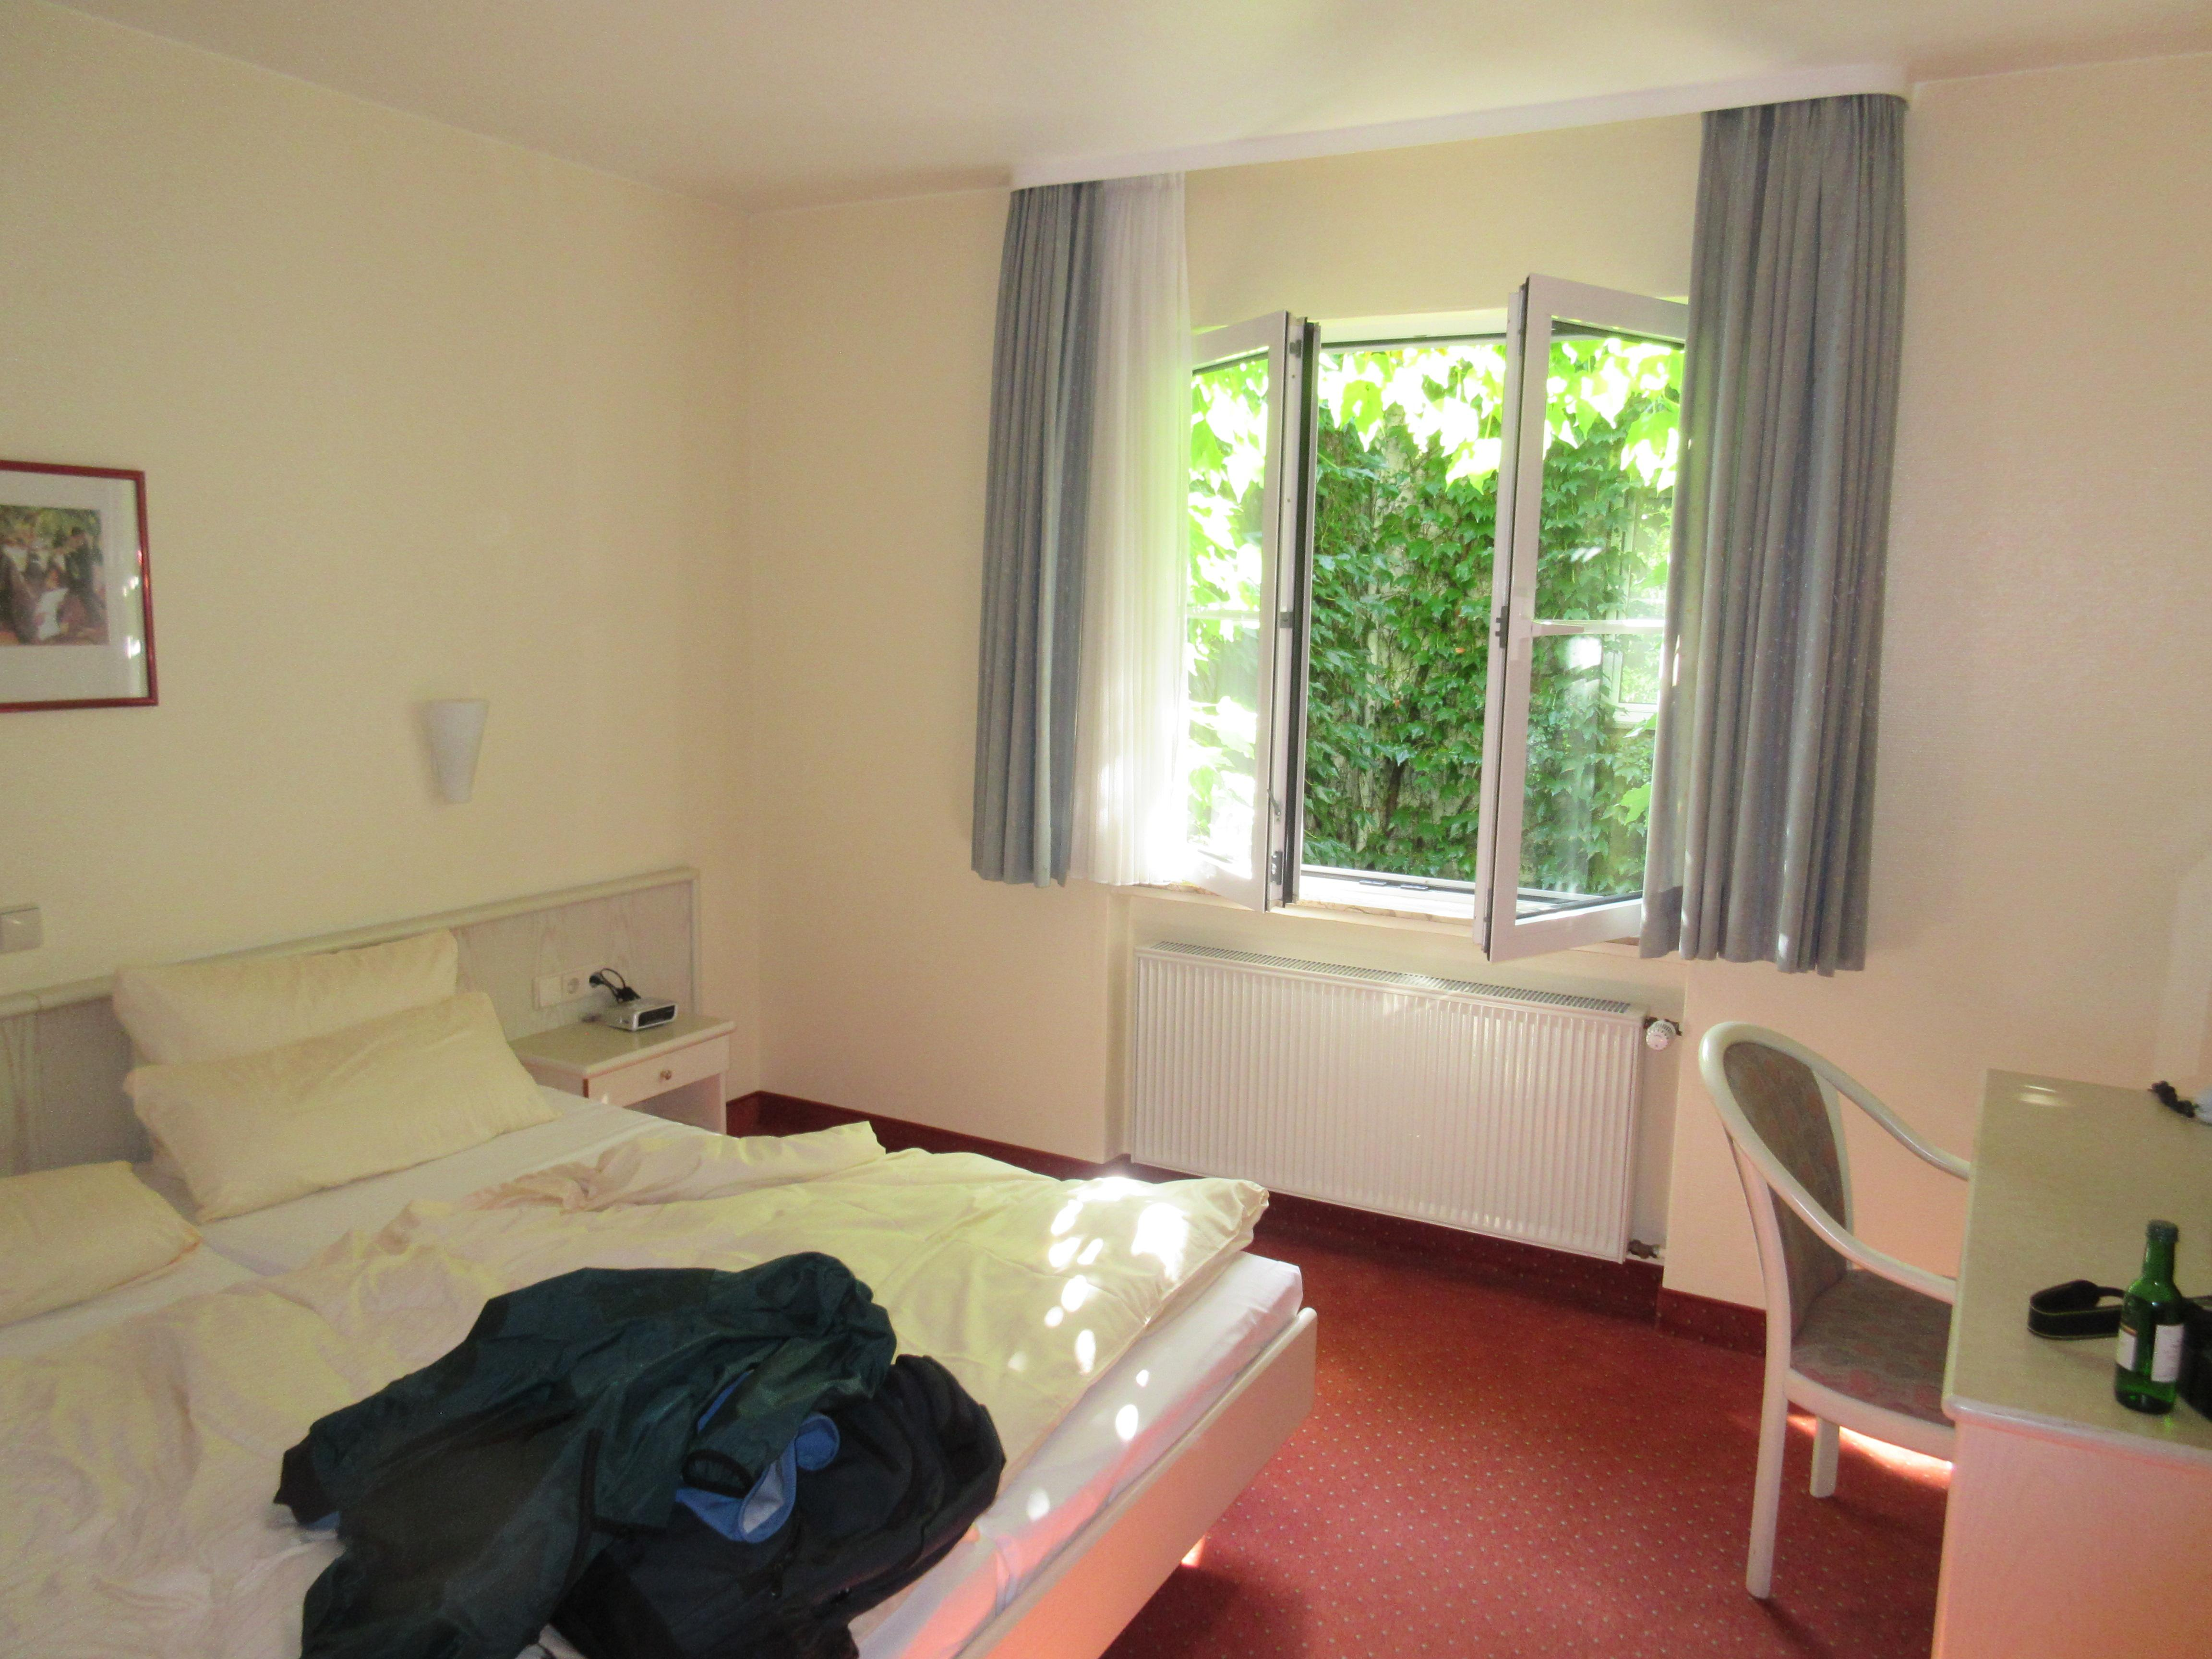 Bedroom toward window on interior courtyard